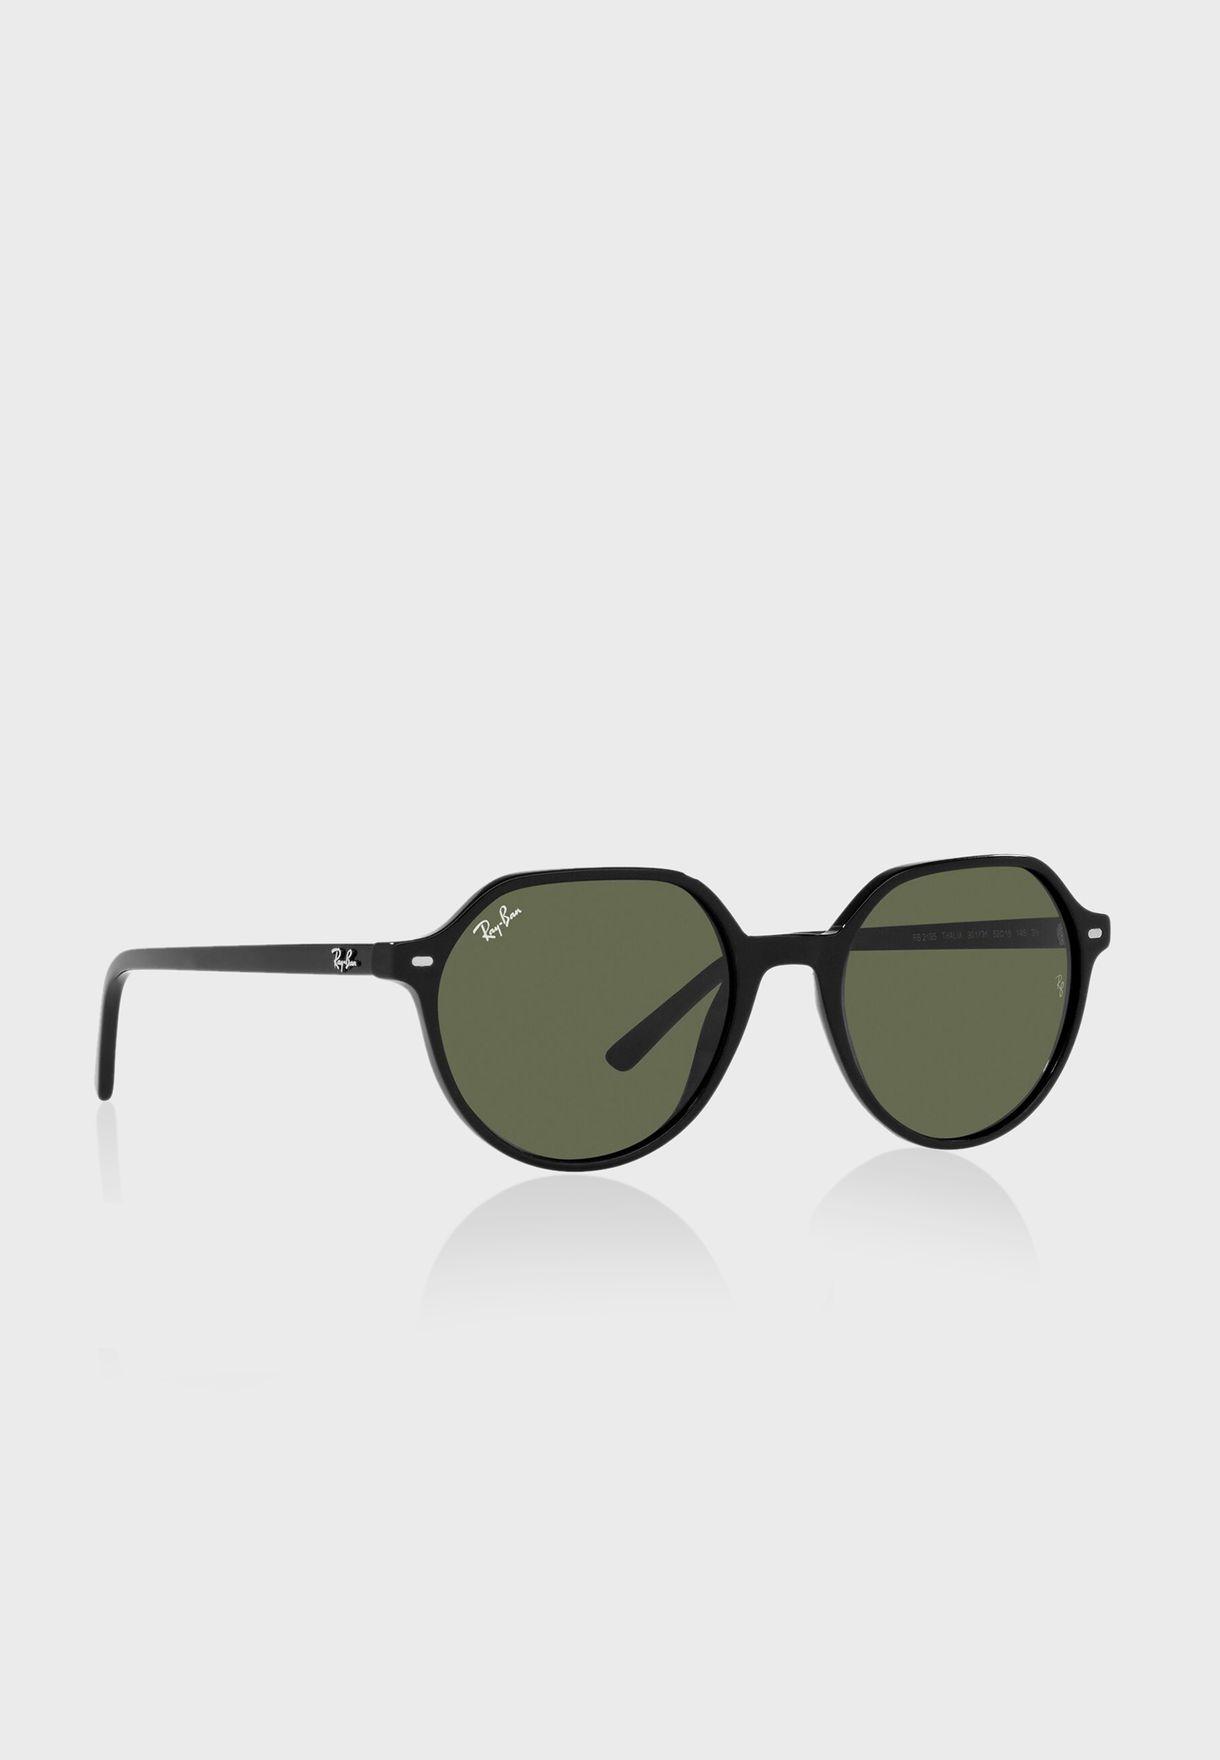 0Rb2195 Wayfarer Sunglasses